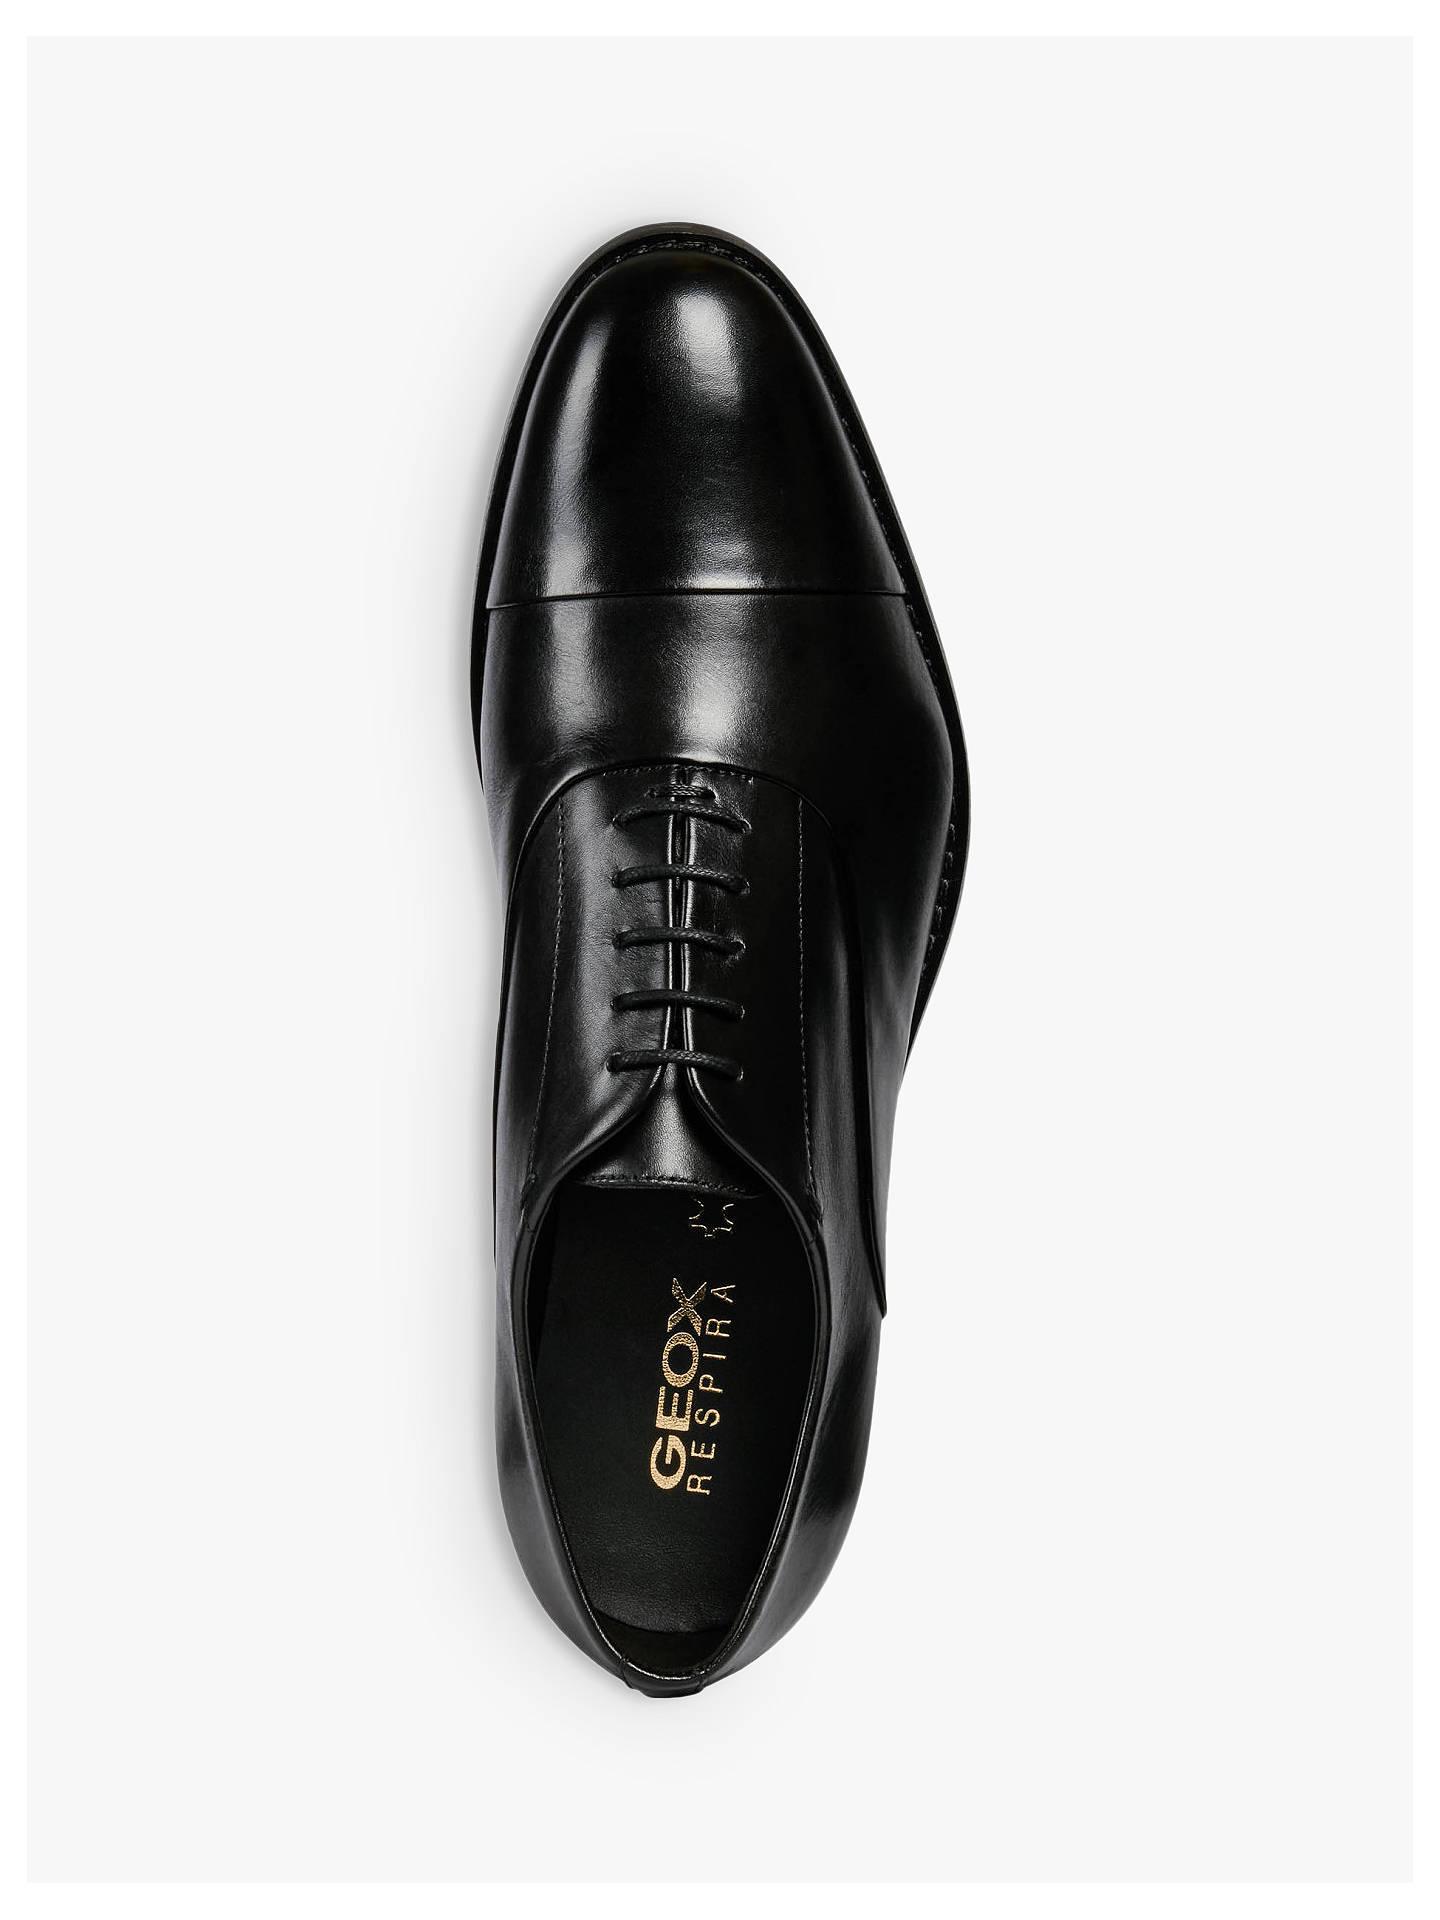 Ventana mundial trompeta ala  Geox Hampstead Leather Oxford Shoes at John Lewis & Partners